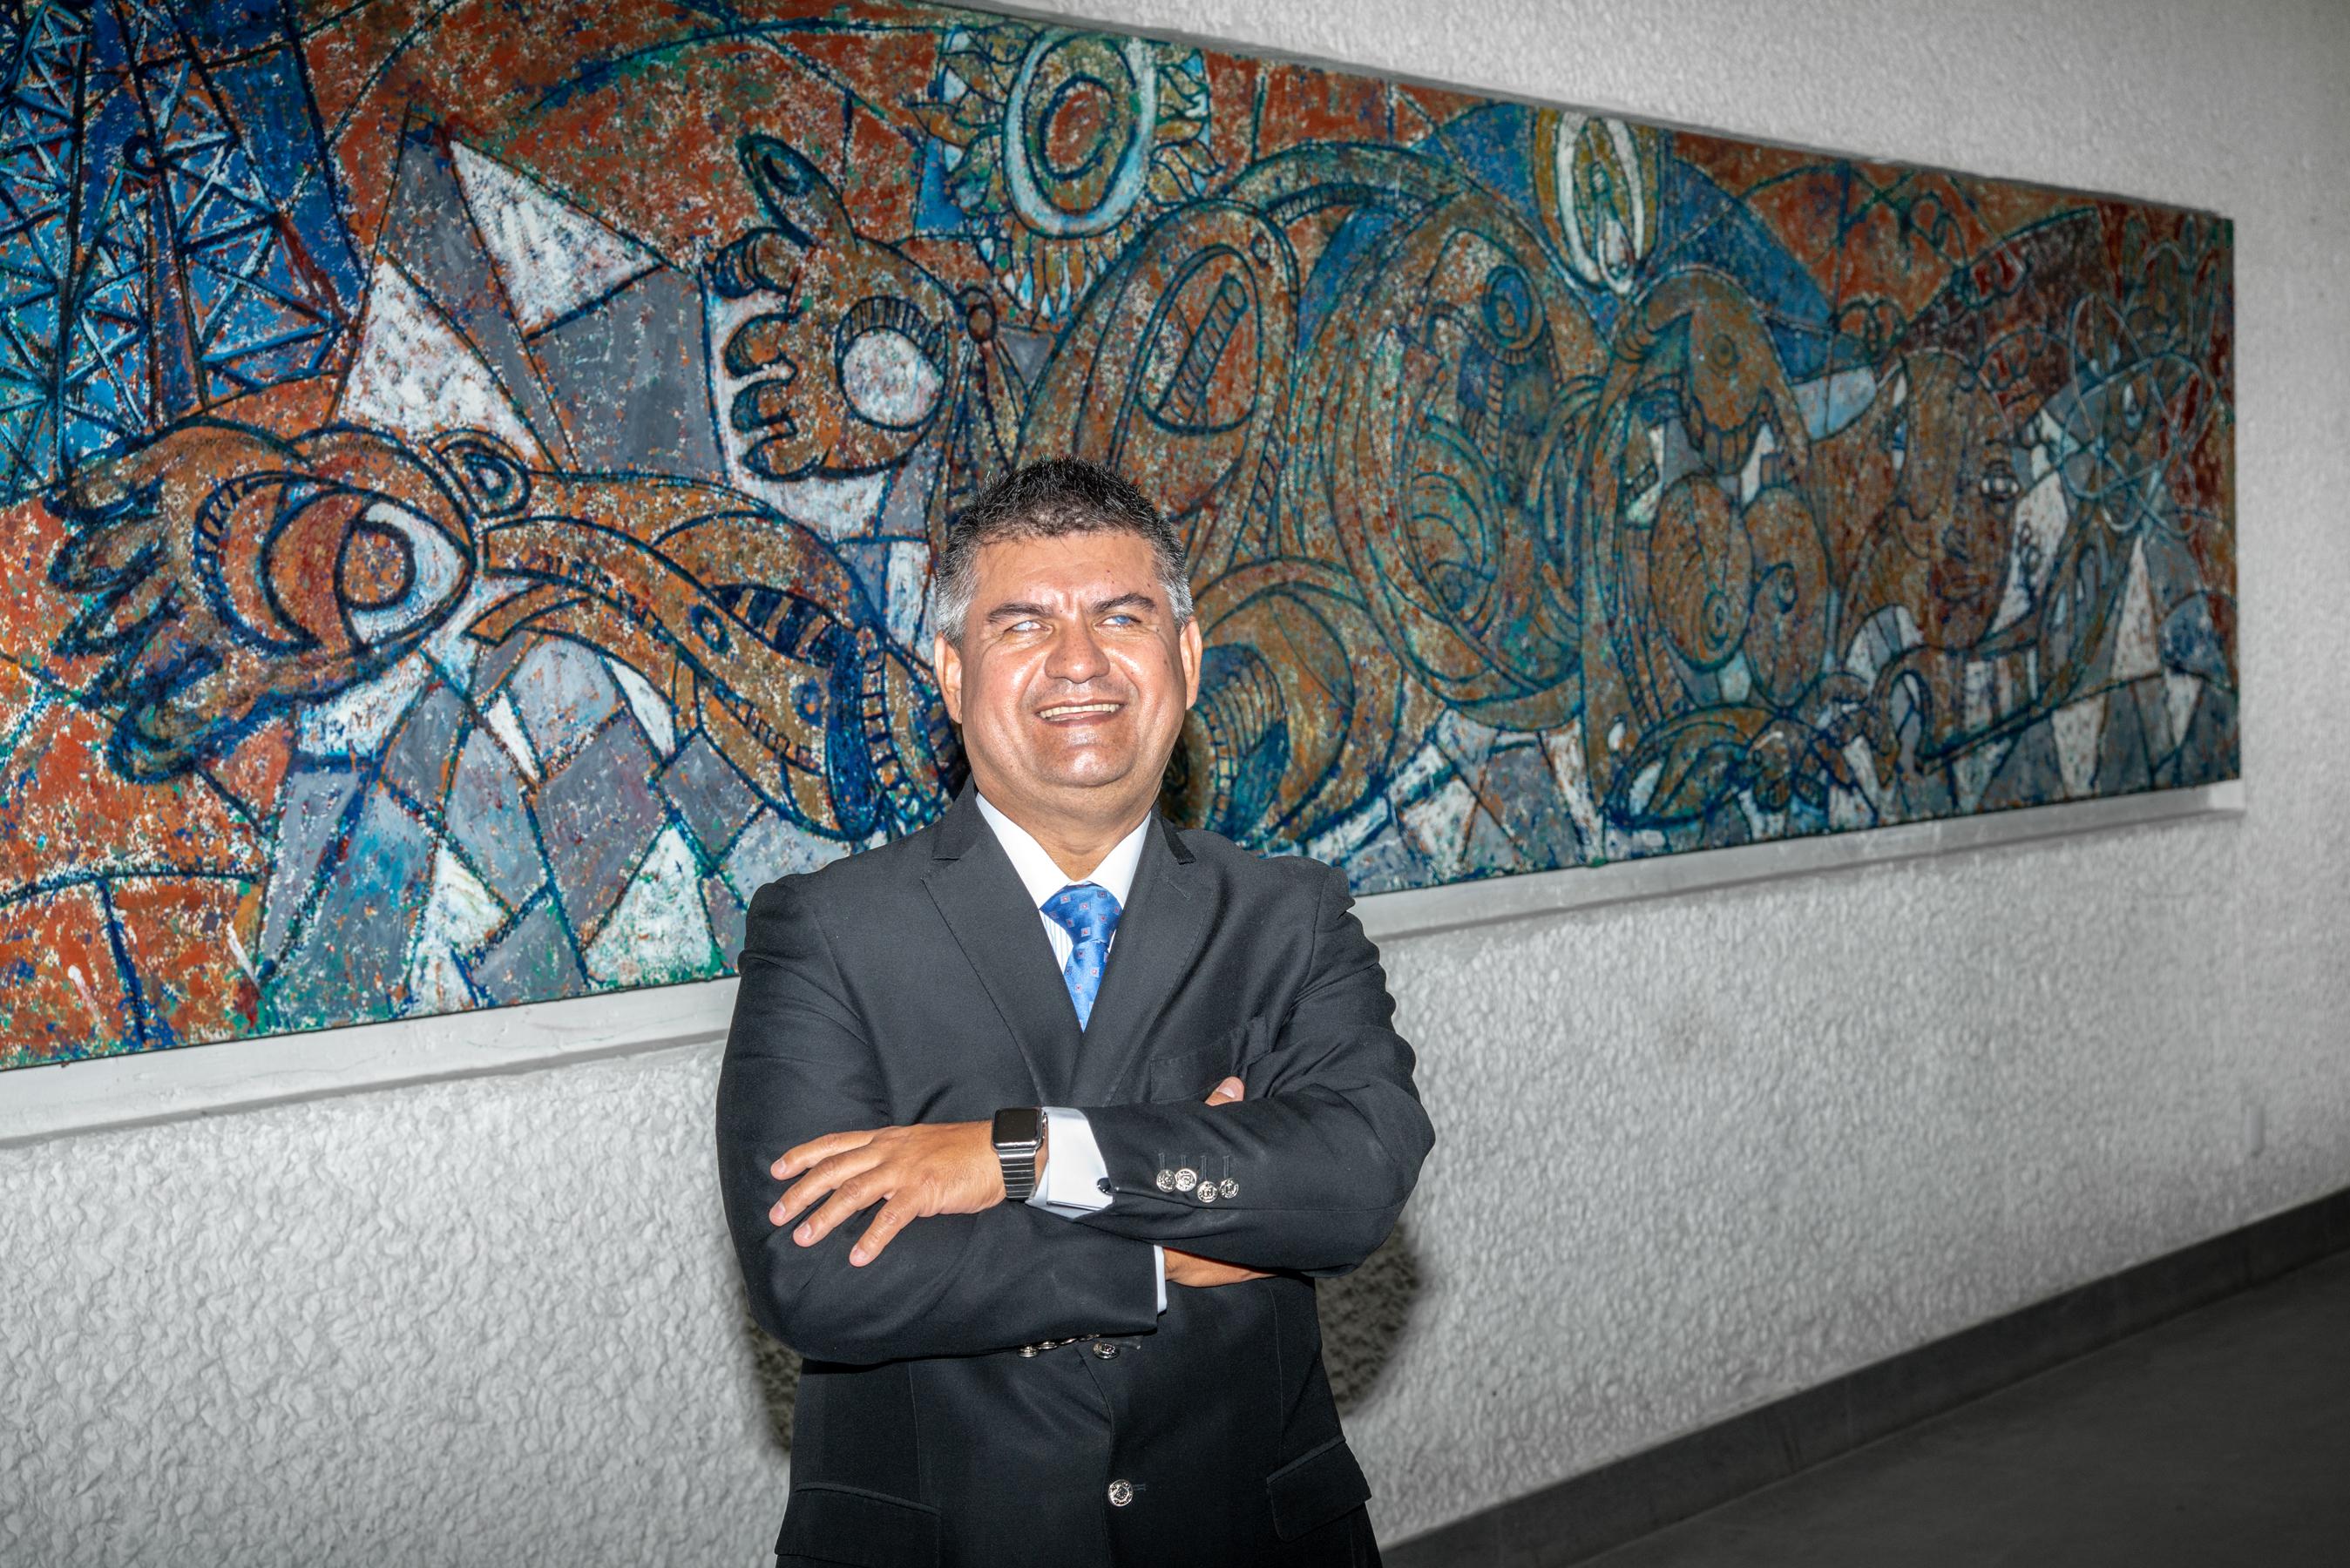 """Consejos de resiliencia para aplicar en tu vida"" Entrevista por Nayo Escobar"